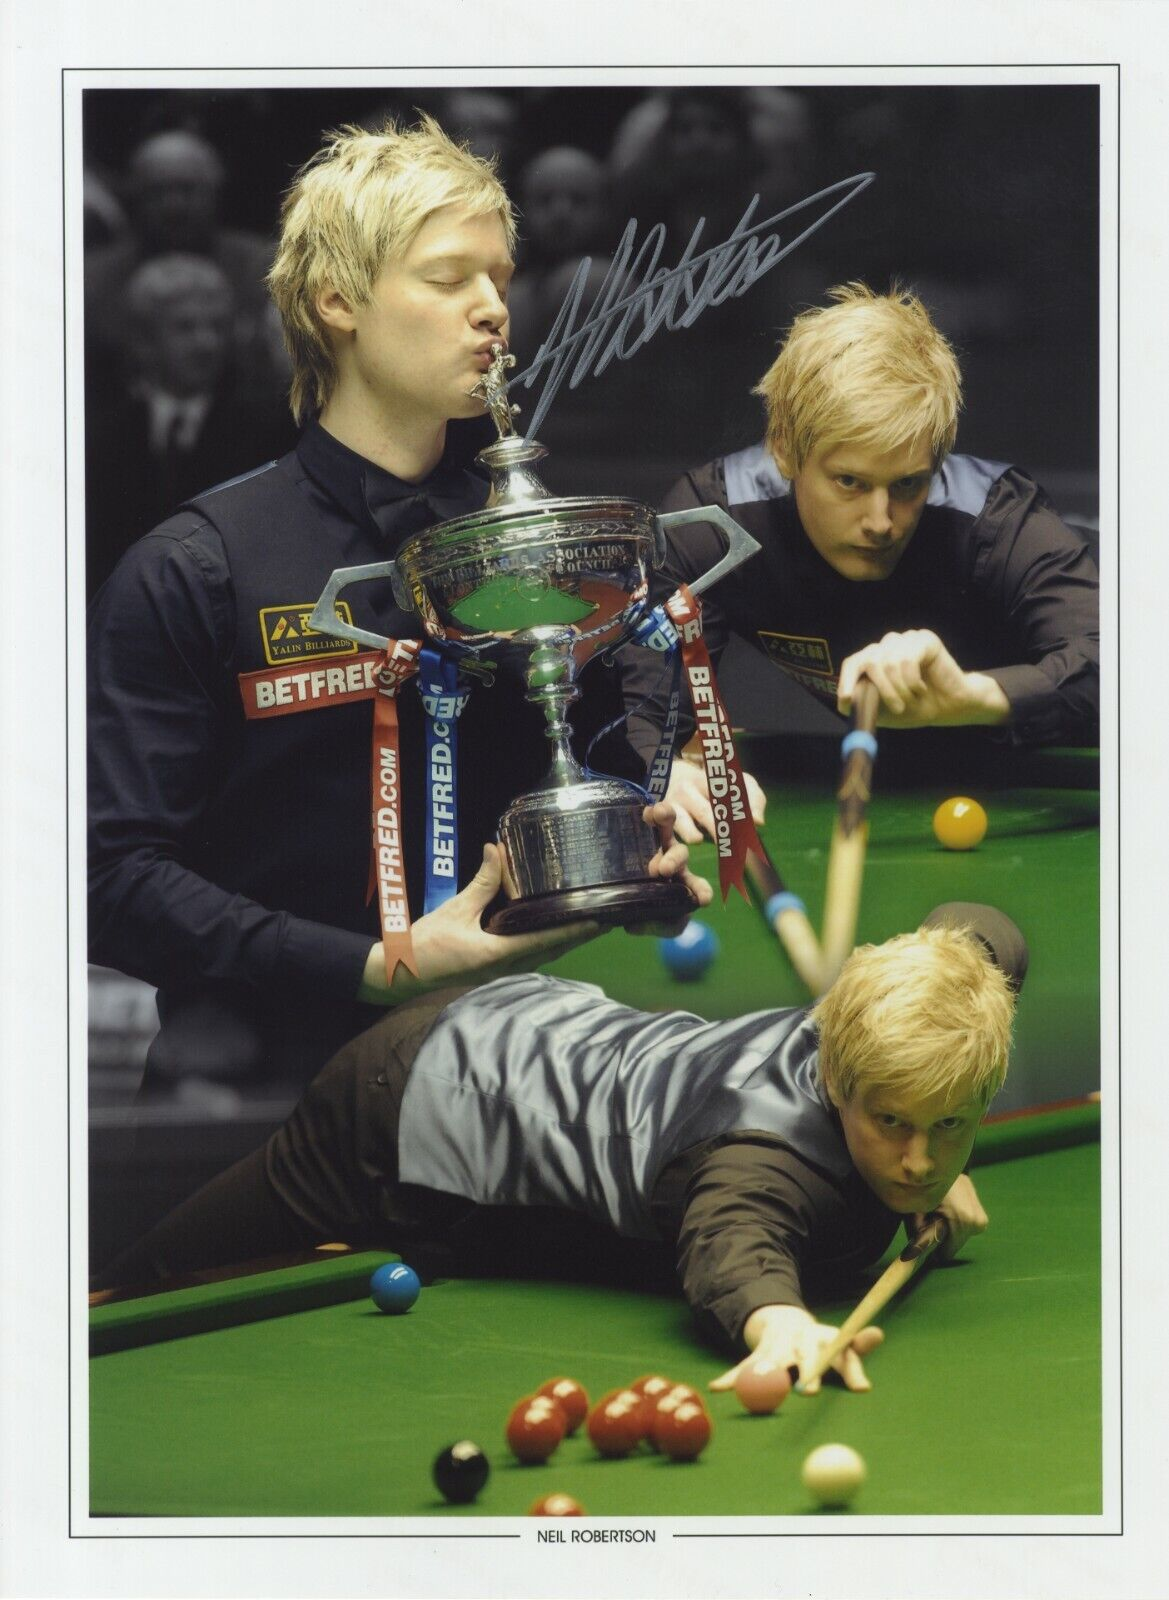 Neil Robertson  Australian Snooker Player '2010 World Champion' I/P Signed Photo